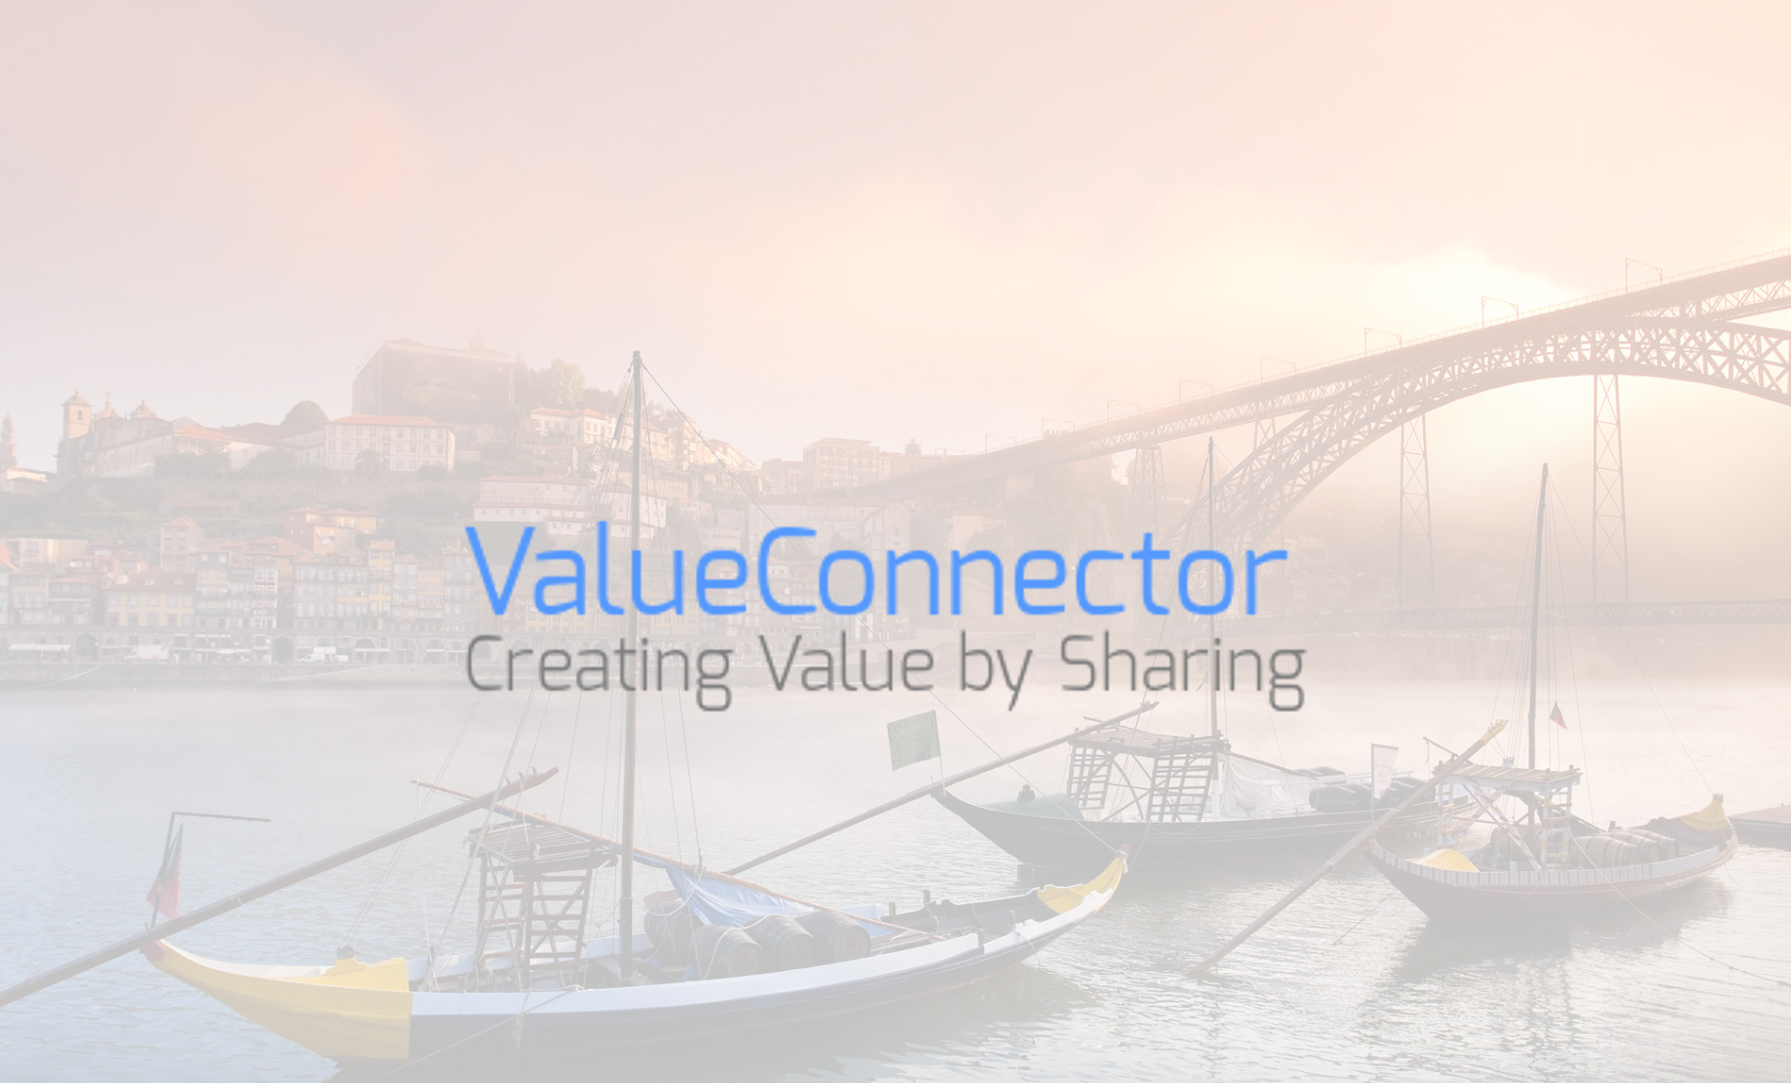 A ValueConnector